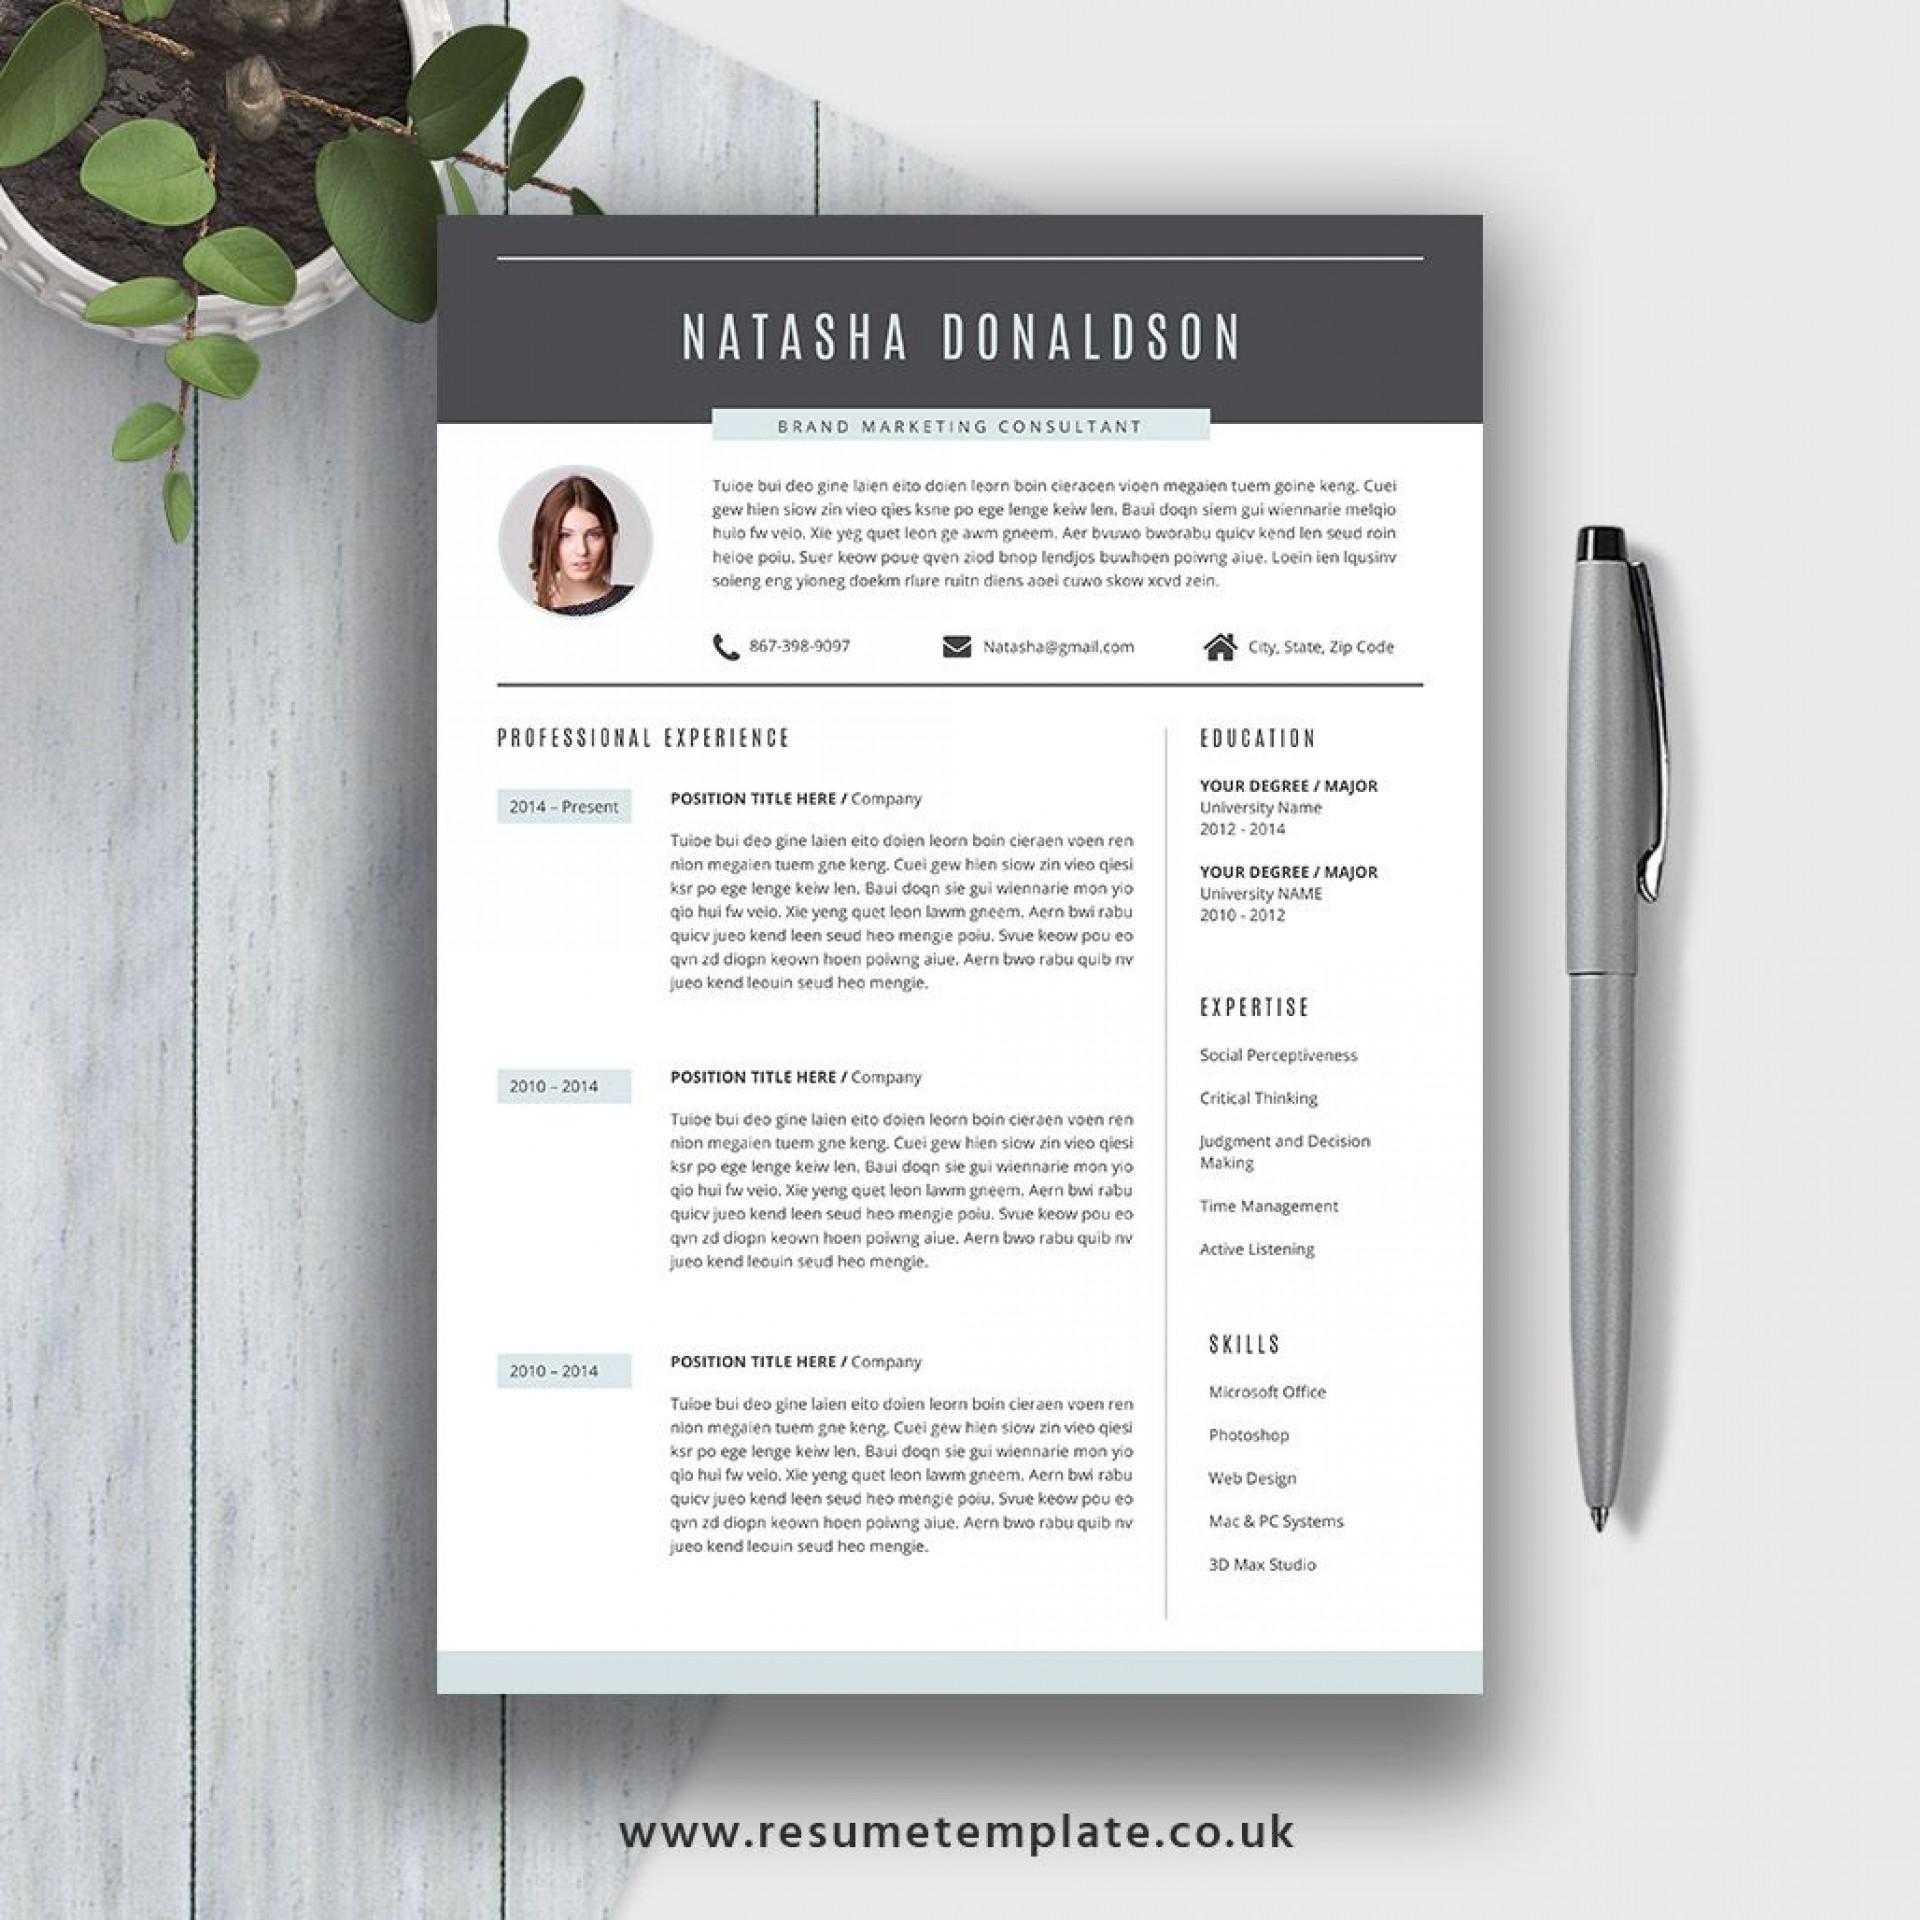 008 Wonderful Resume Template Microsoft Word 2007 Design  In Office M1920